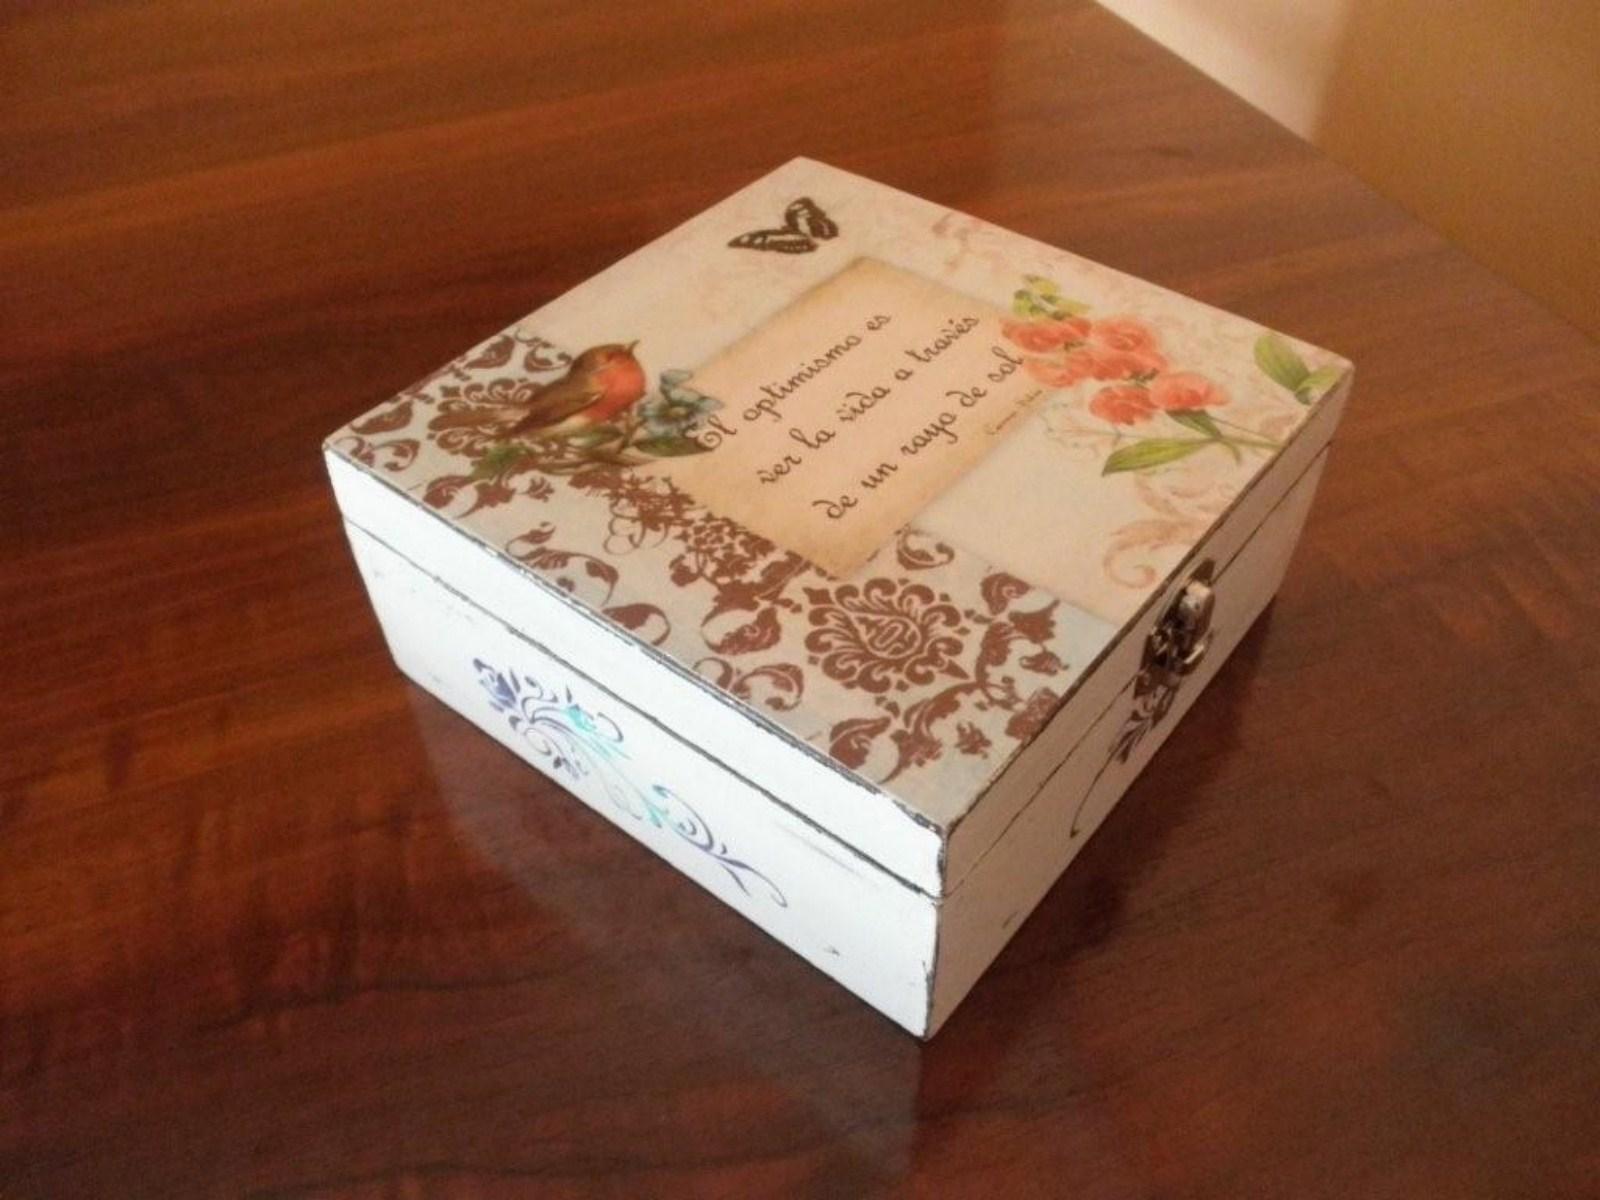 Ciento volando cajas de madera pintada - Manualidades con caja de madera ...